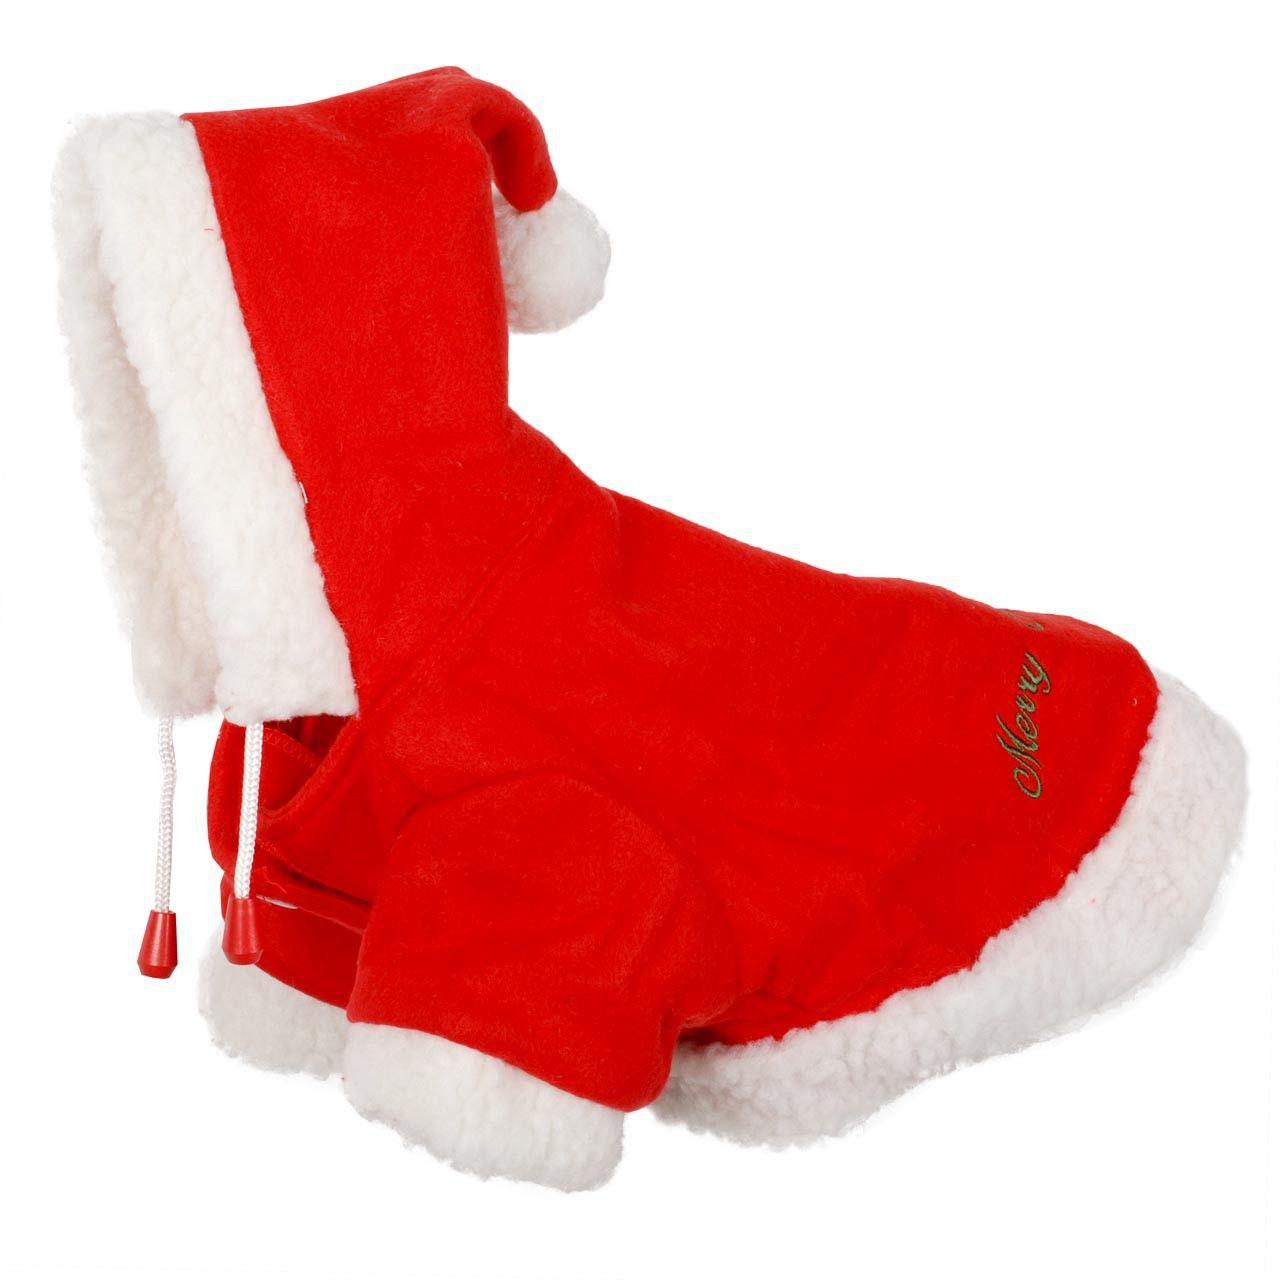 Leuke #QHP #Kerst #deken voor je #hond in #kerst style. #hondendeken #kerst #christmas #rood #wit #dogrug #rug #dog #divoza